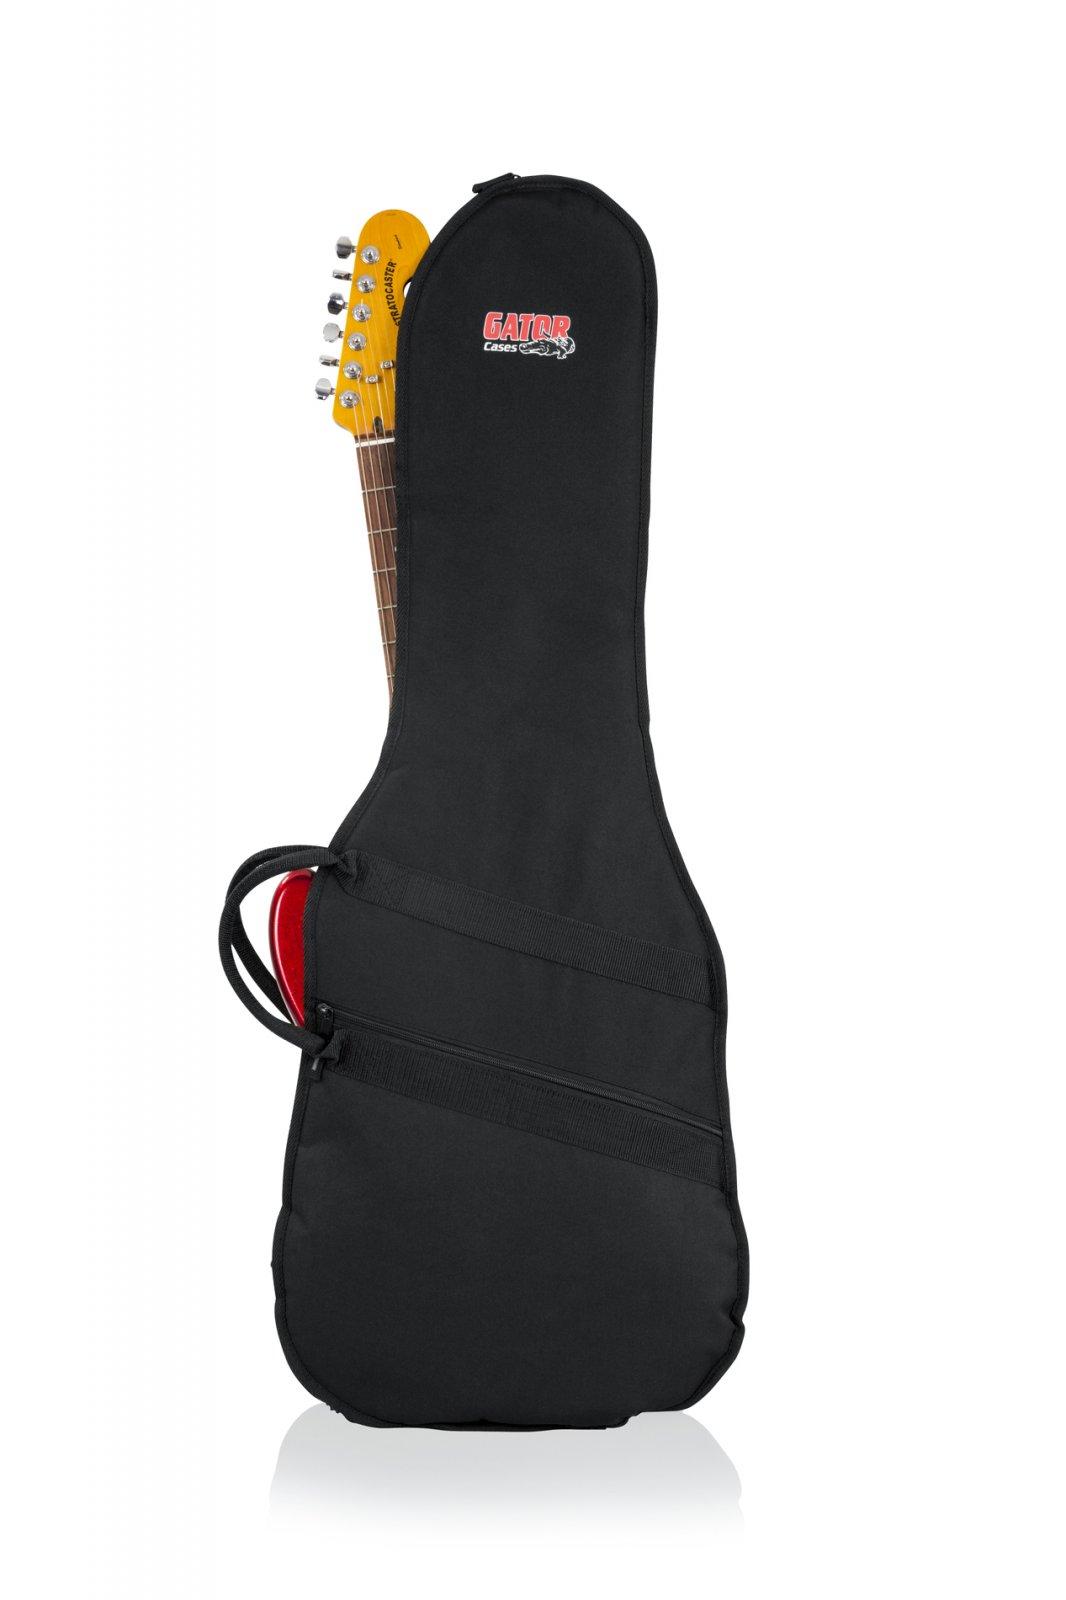 GATOR GBE  Electric Guitar Gig Bag